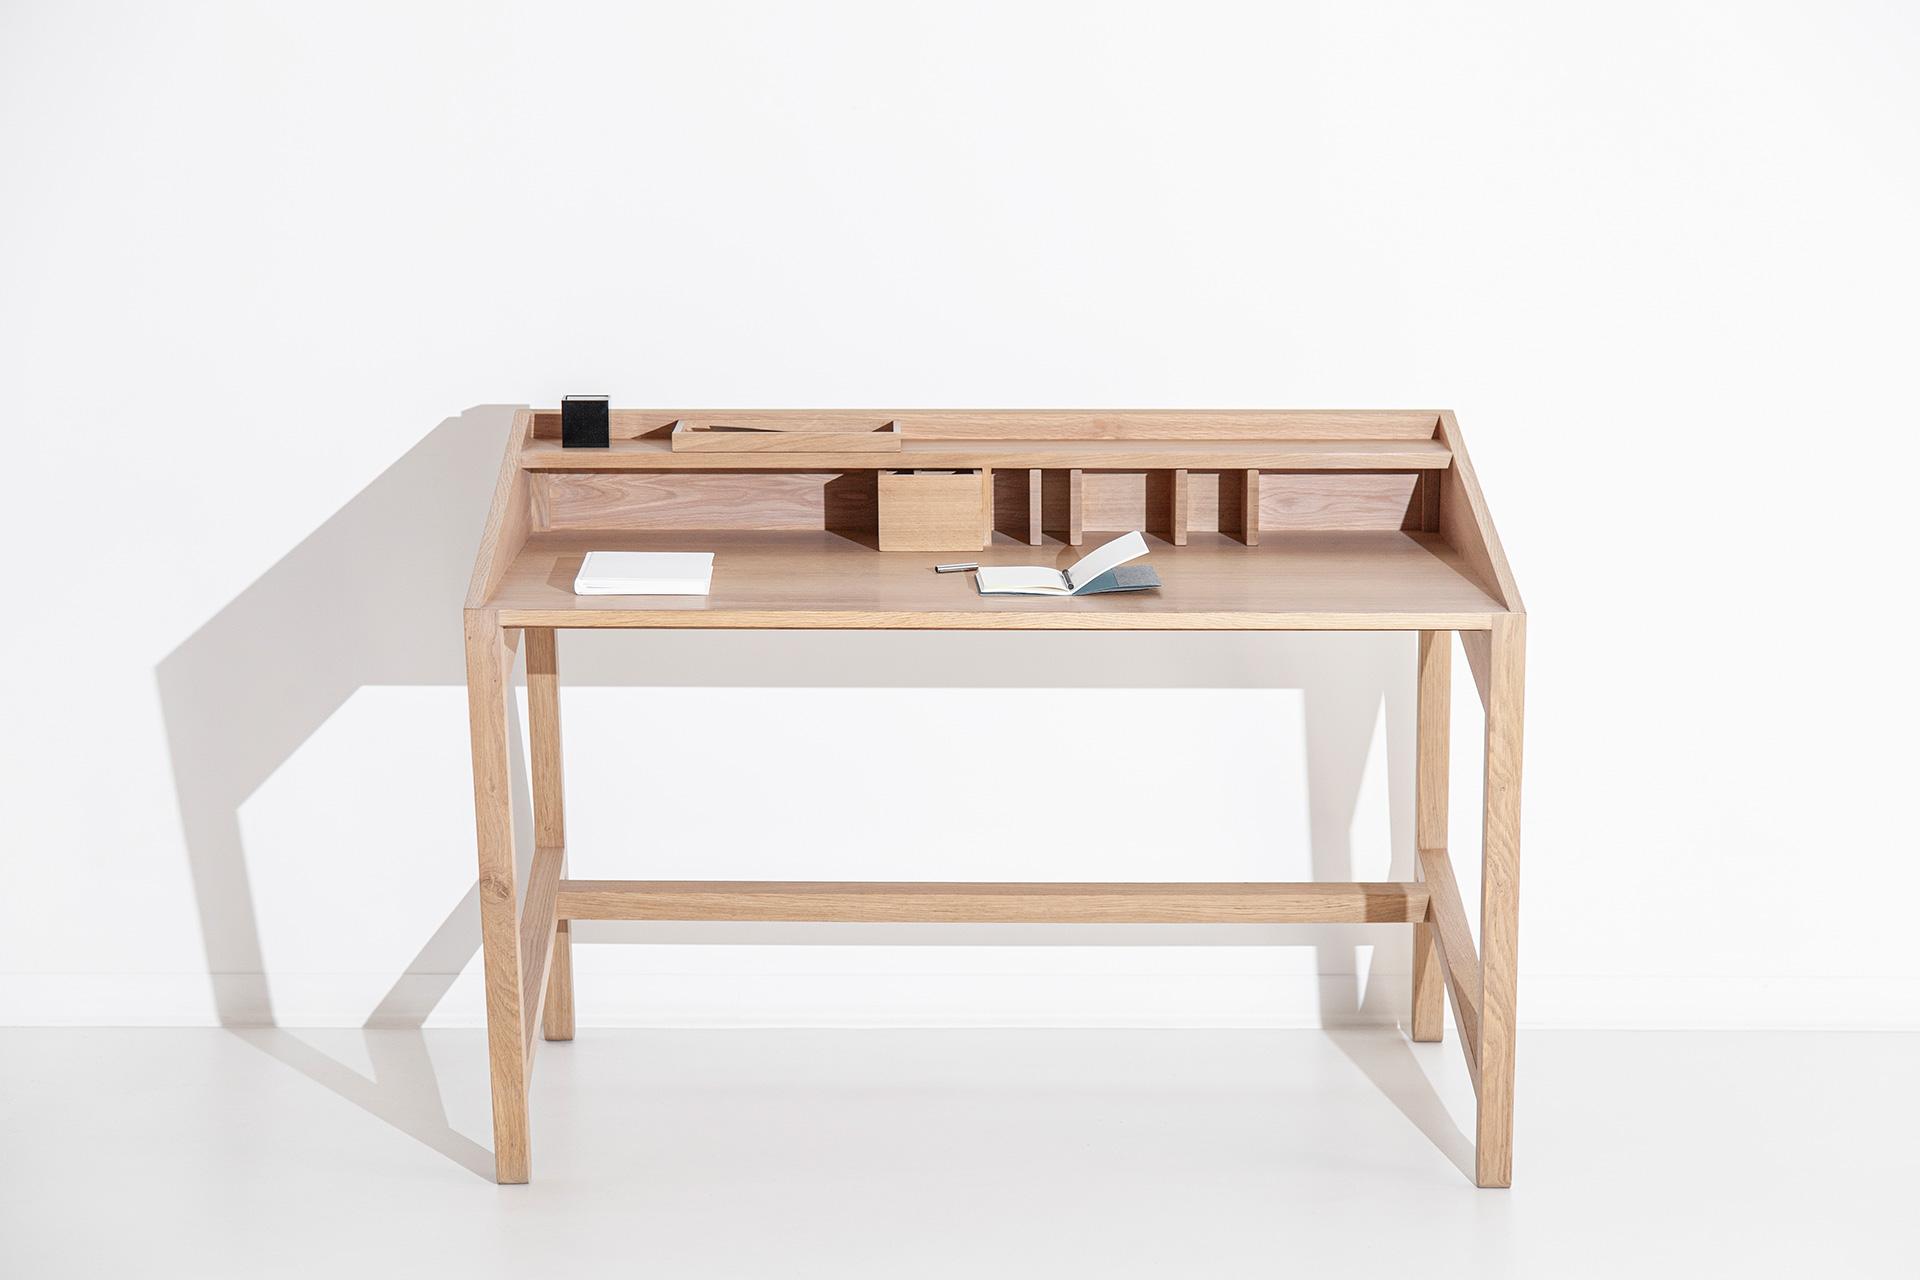 Torta Desk Front - DESIGN BY MIGUEL SOEIRO